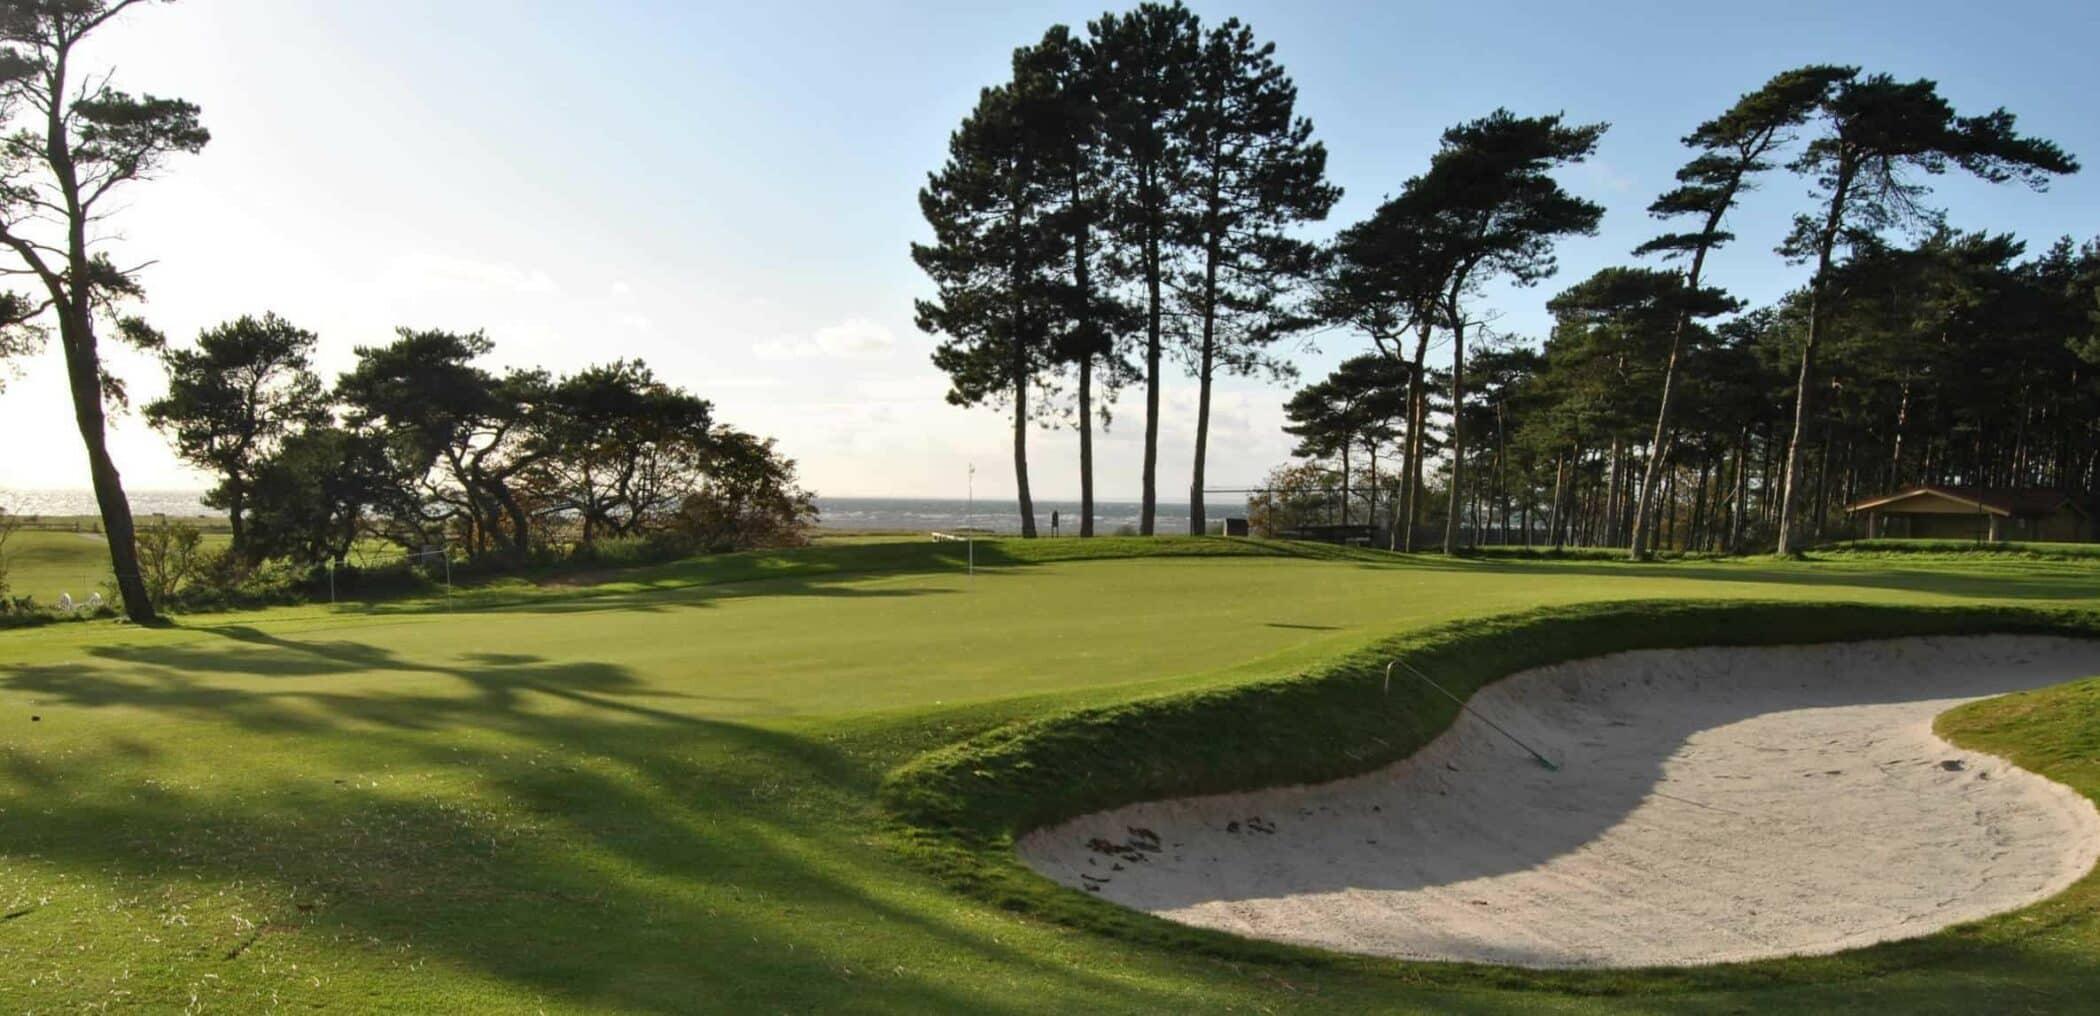 Barseback golfklub, en absolut Skandinavisk topbane